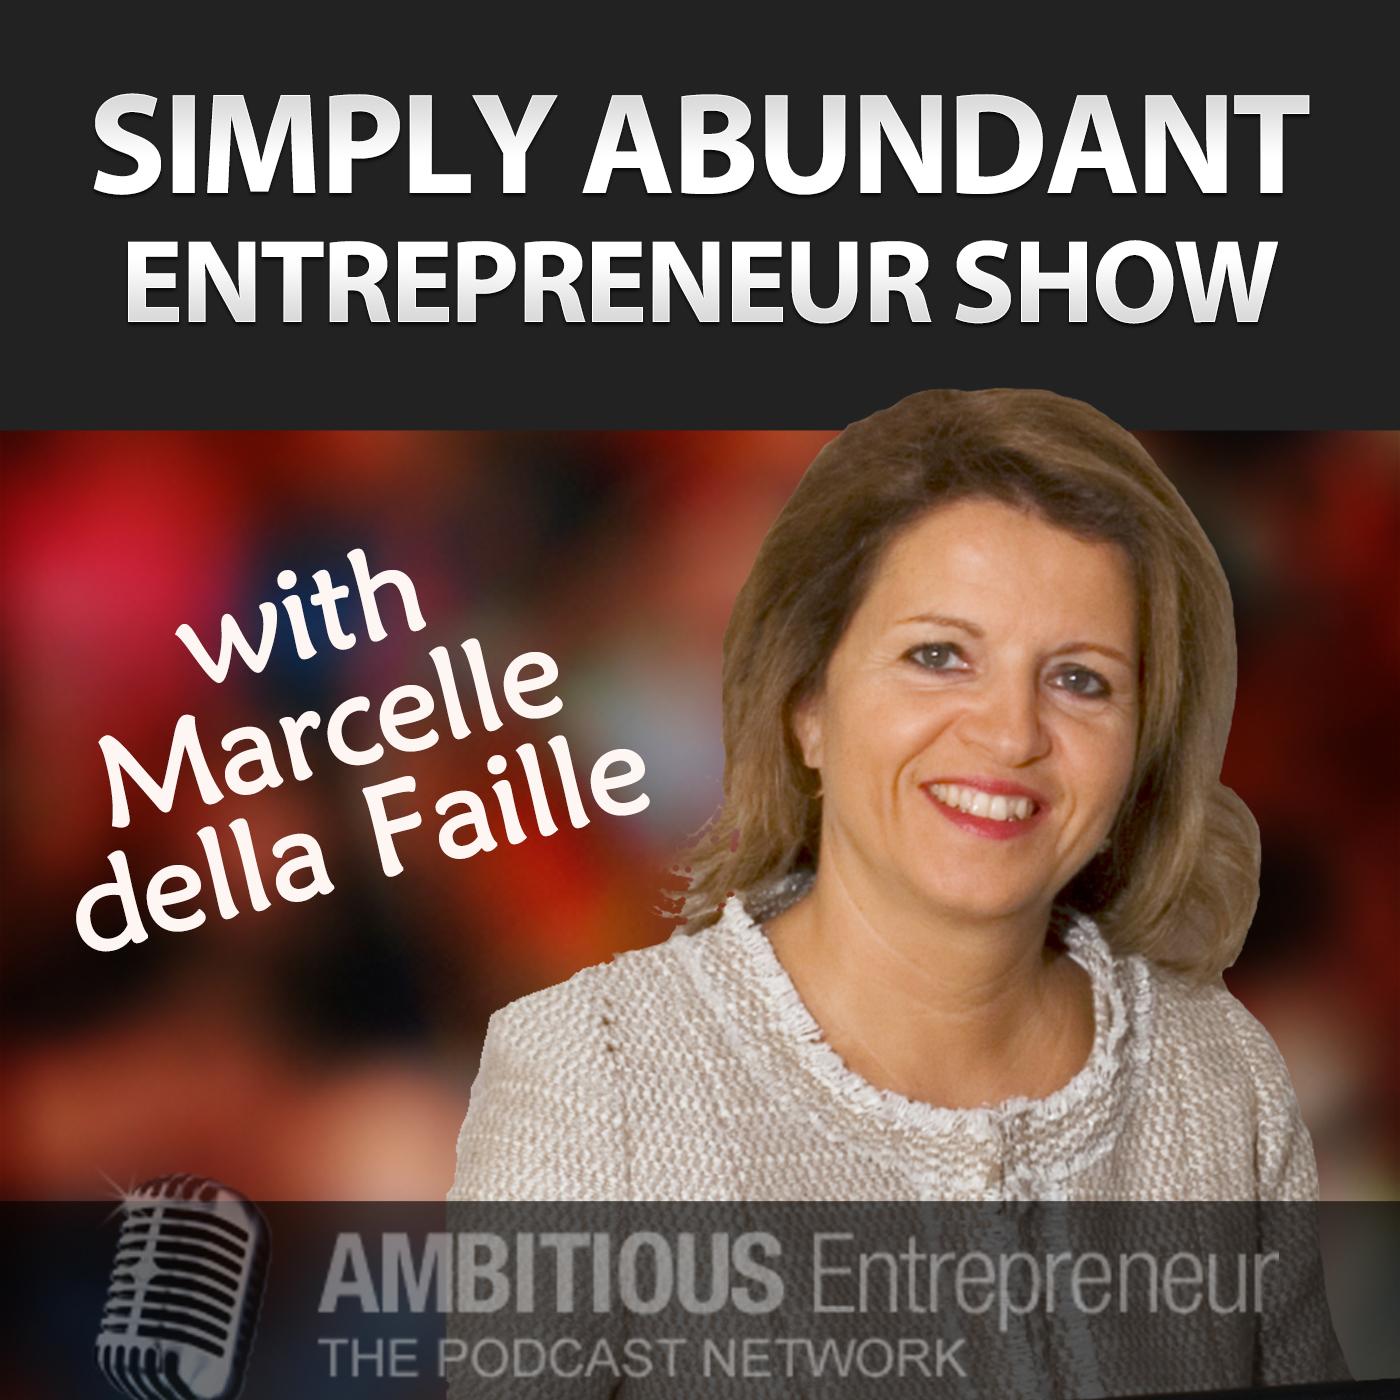 Simply Abundant Entrepreneur Show